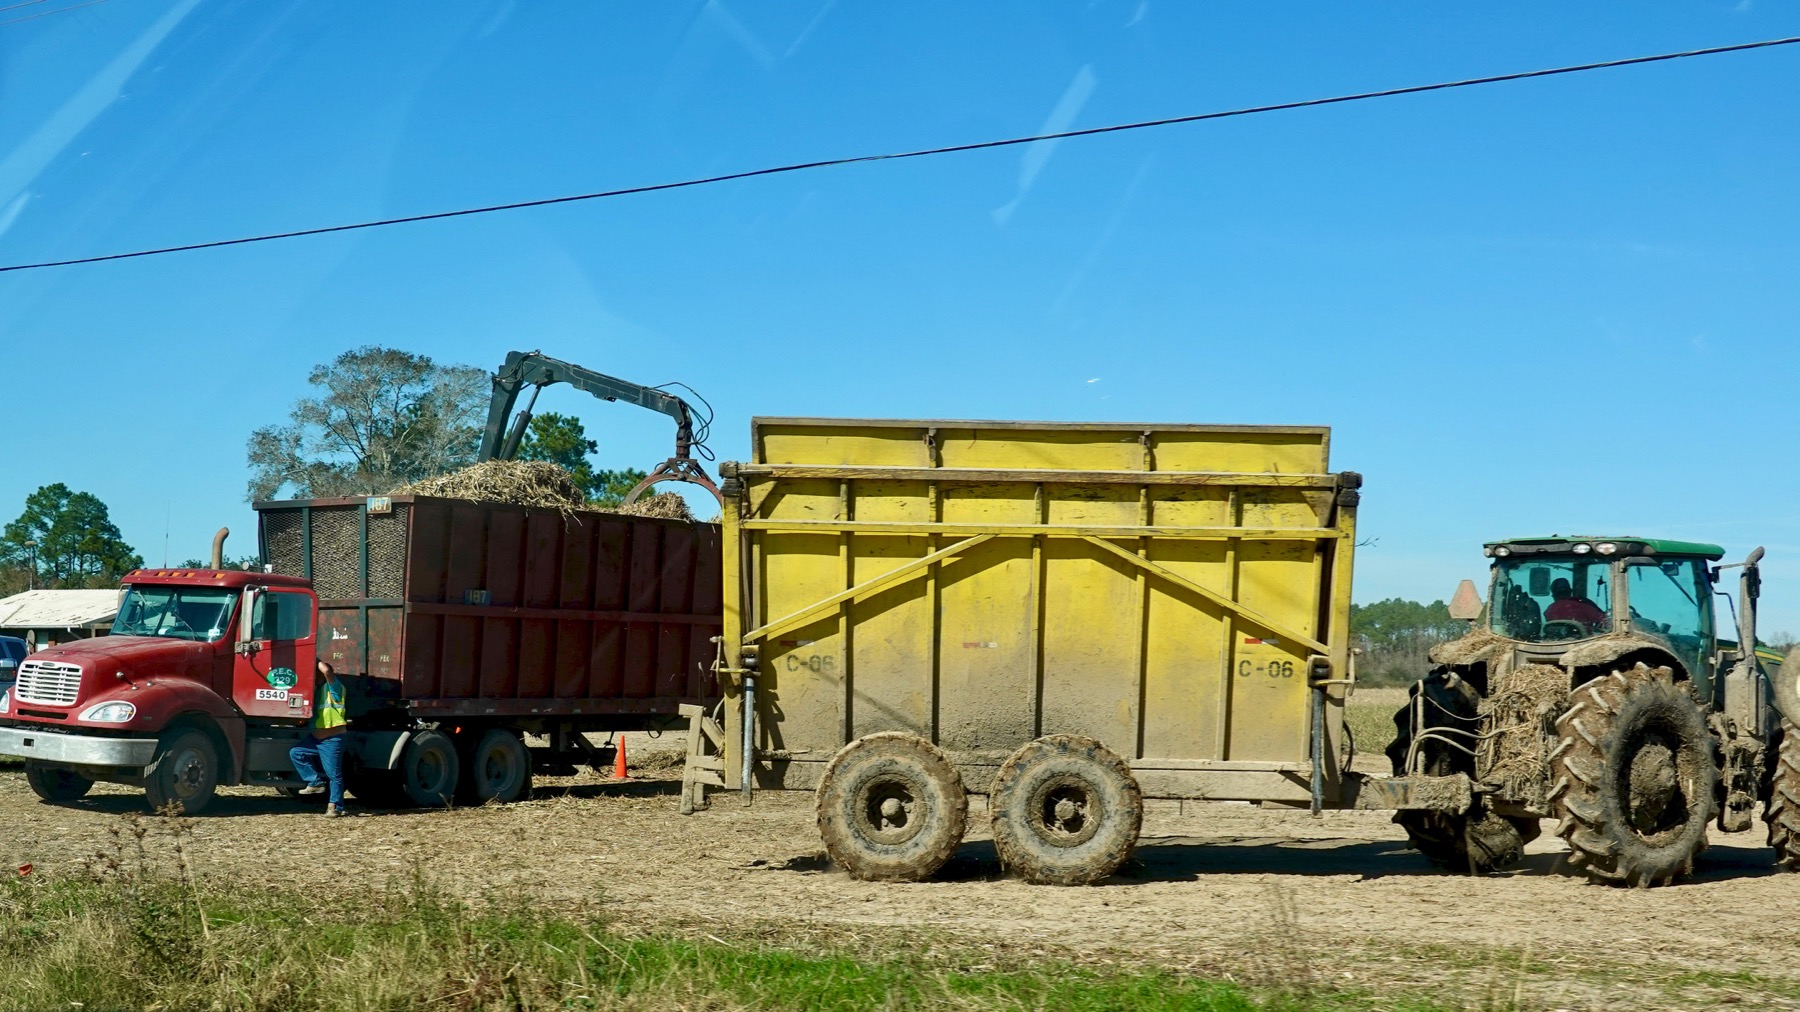 Cane harvesting